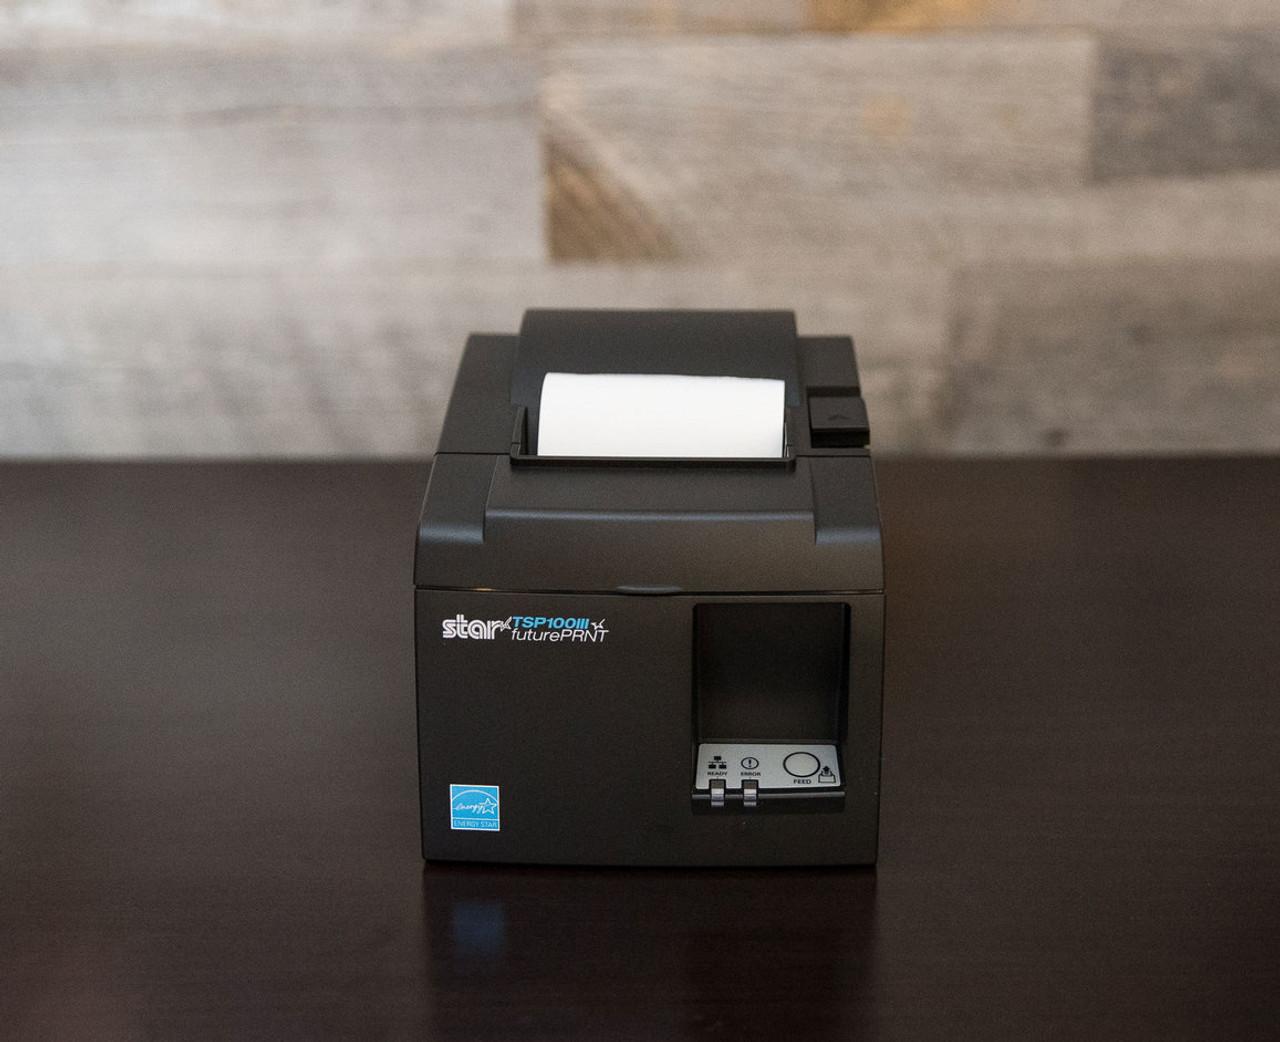 Star Micronics Ethernet Printer